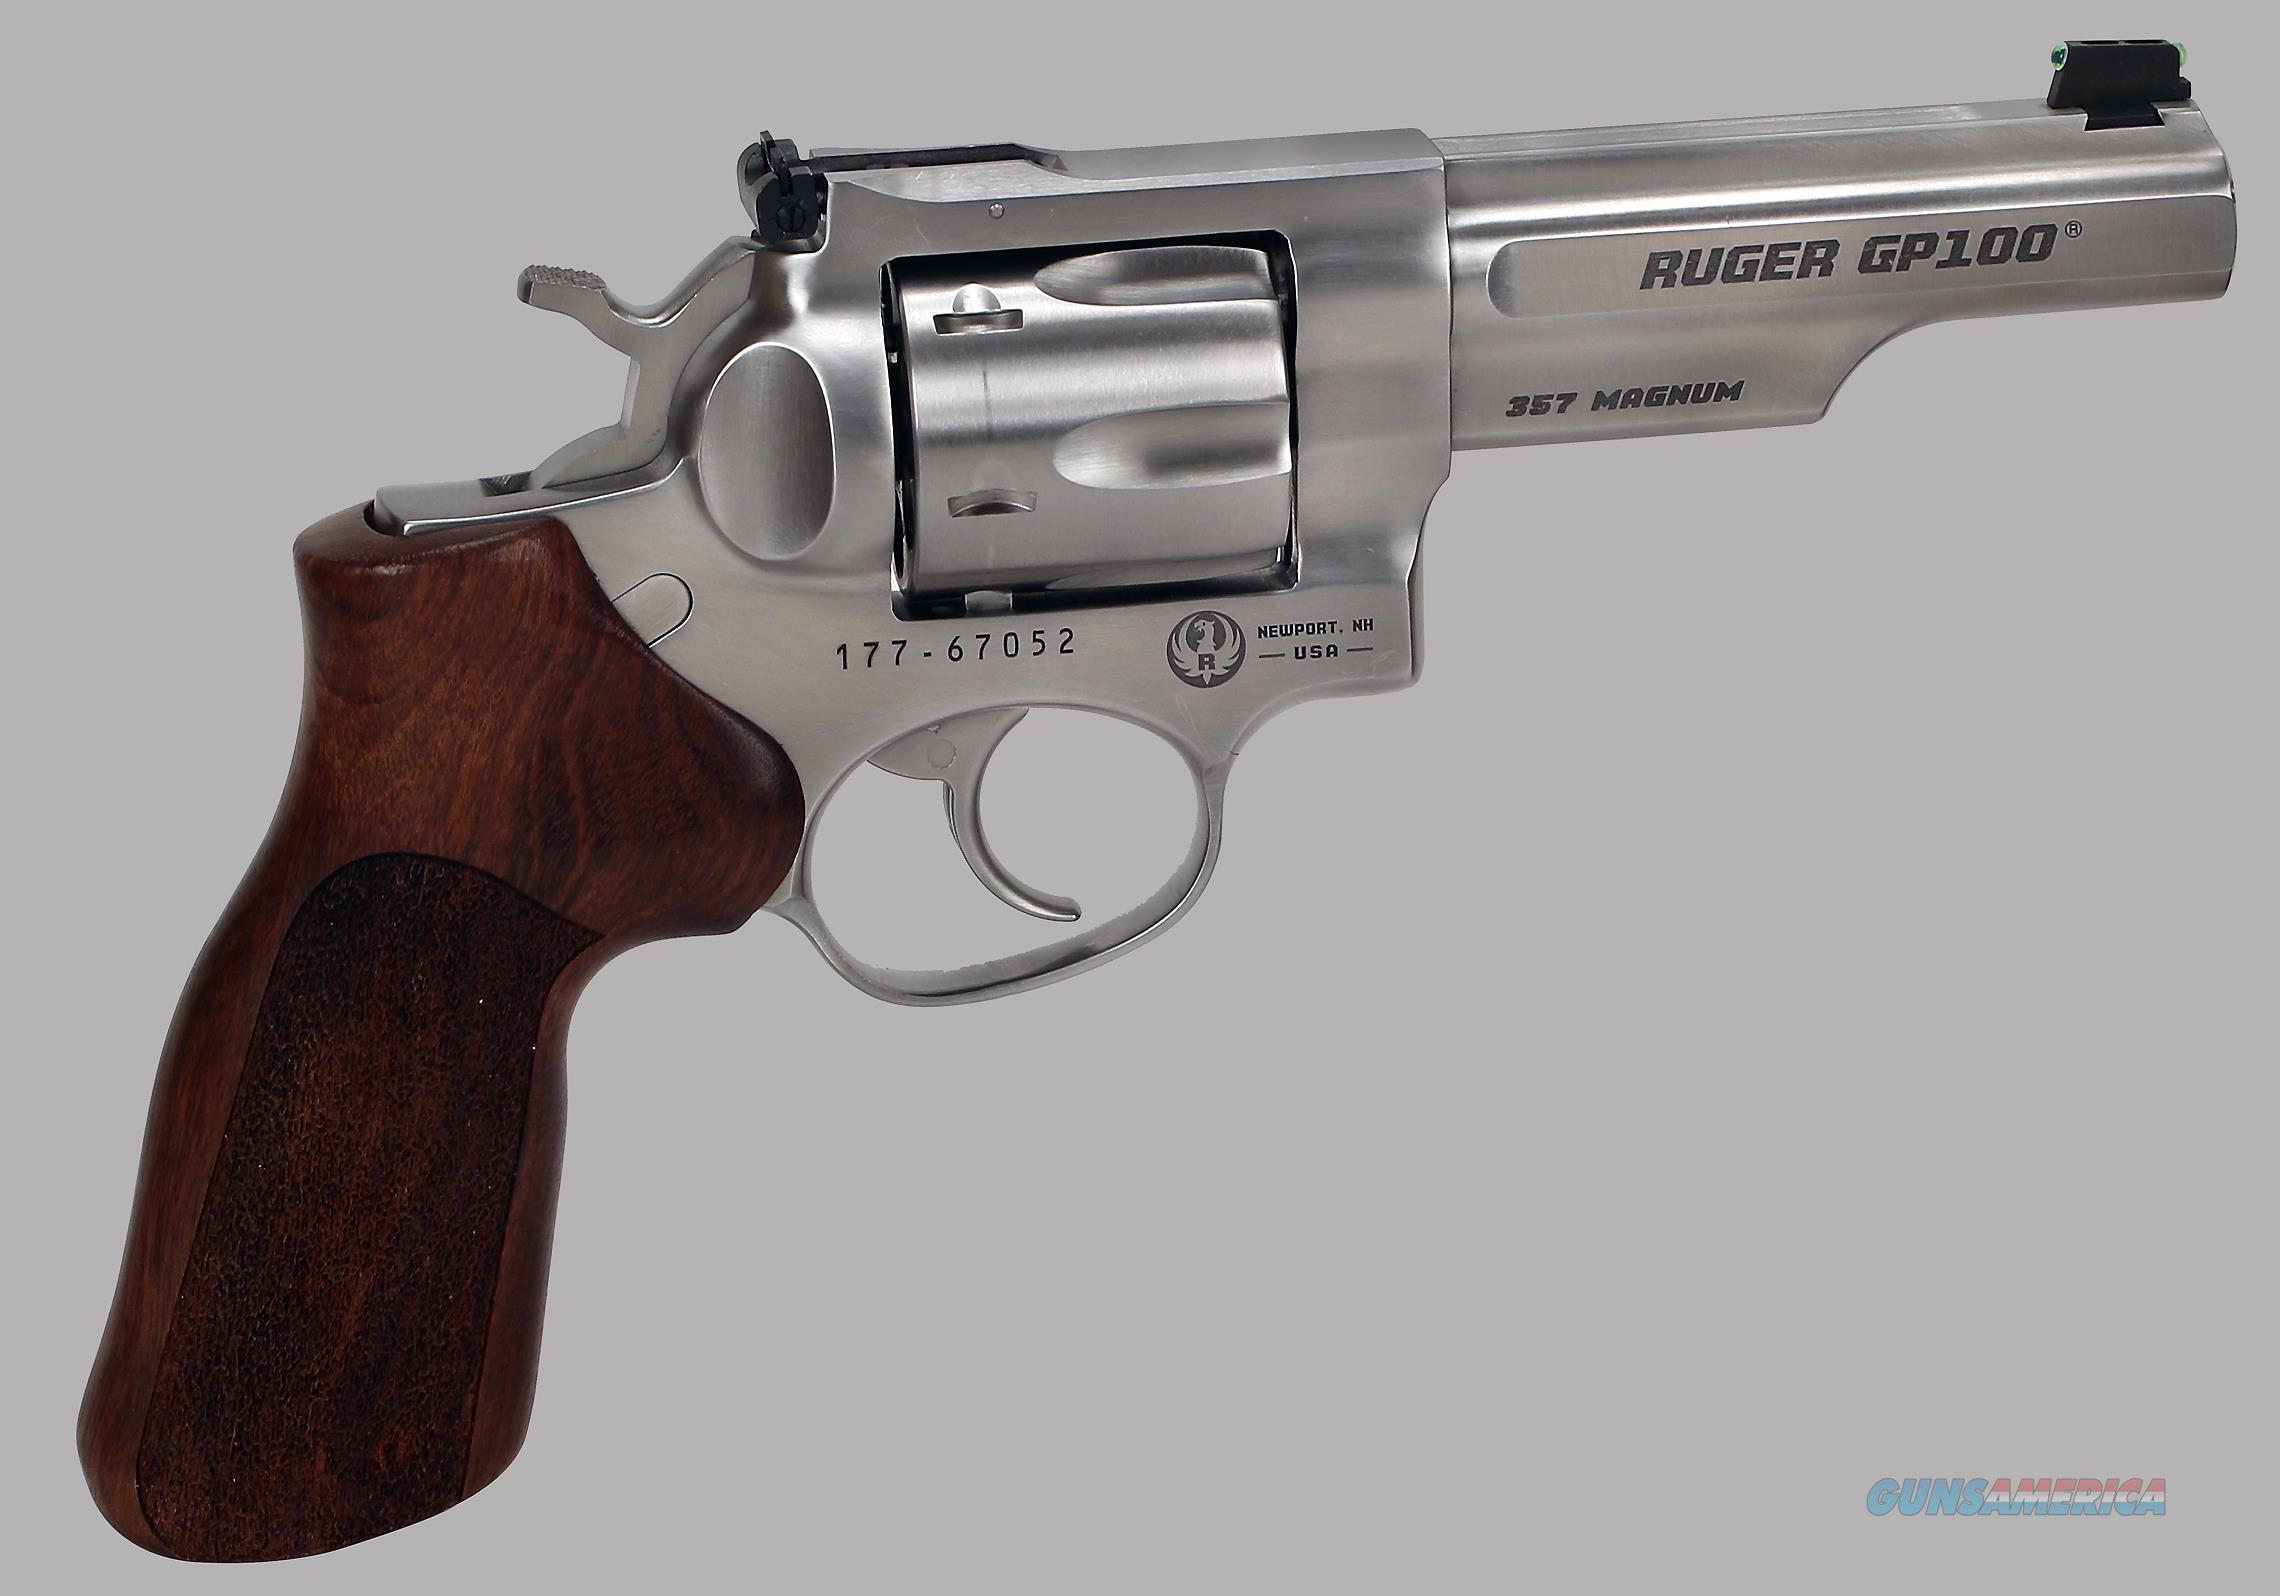 Ruger GP100 Match Champion 357 Magnum Revolver  Guns > Pistols > Ruger Double Action Revolver > GP100